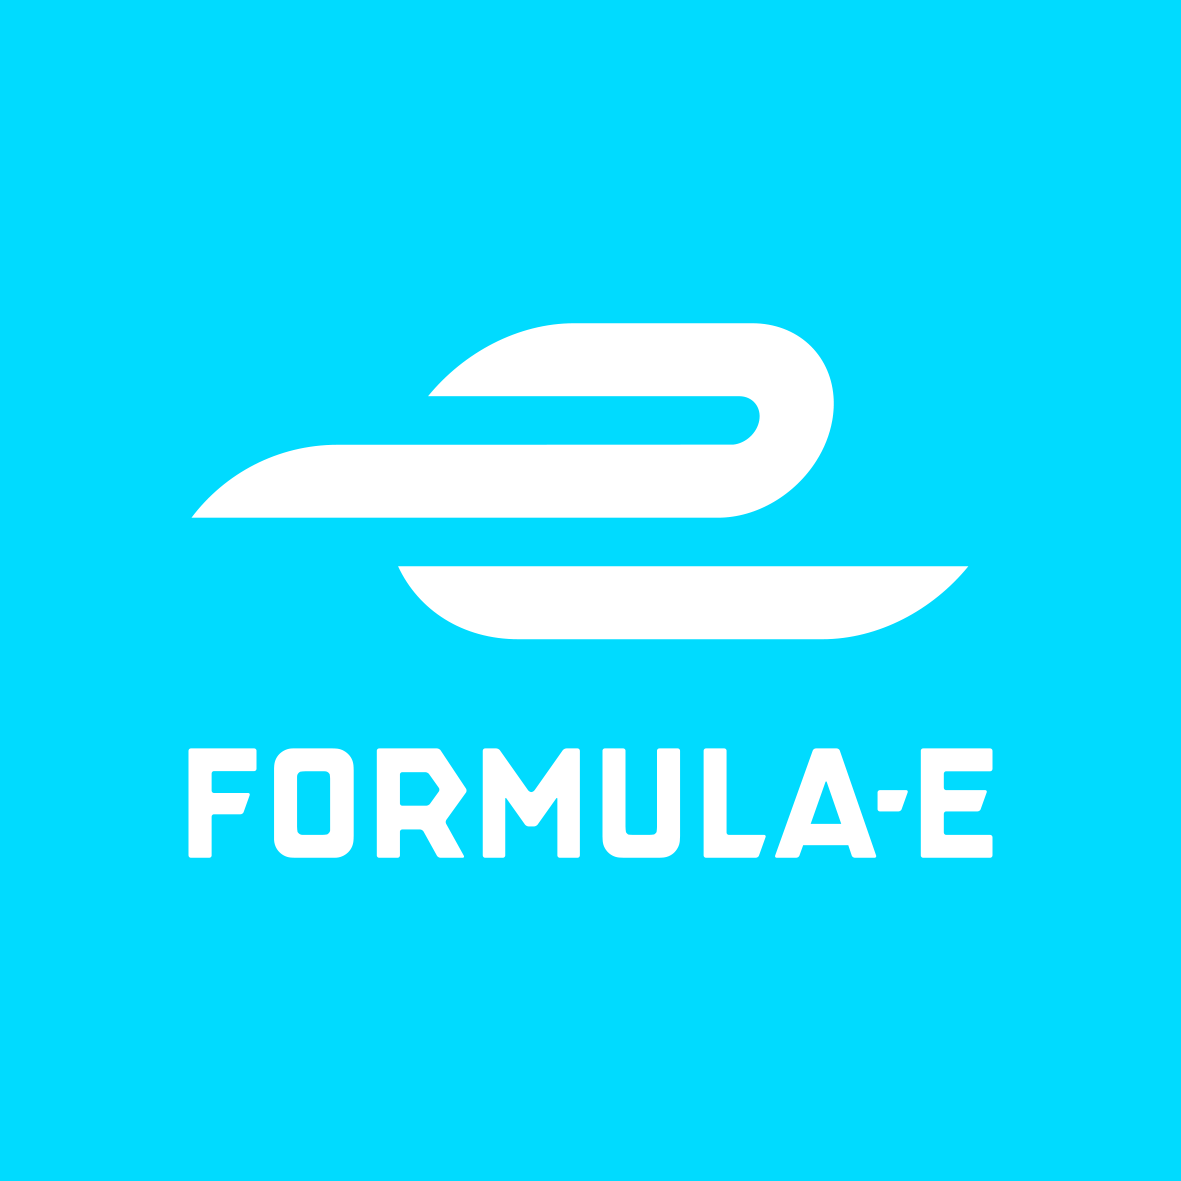 :logo_FE: